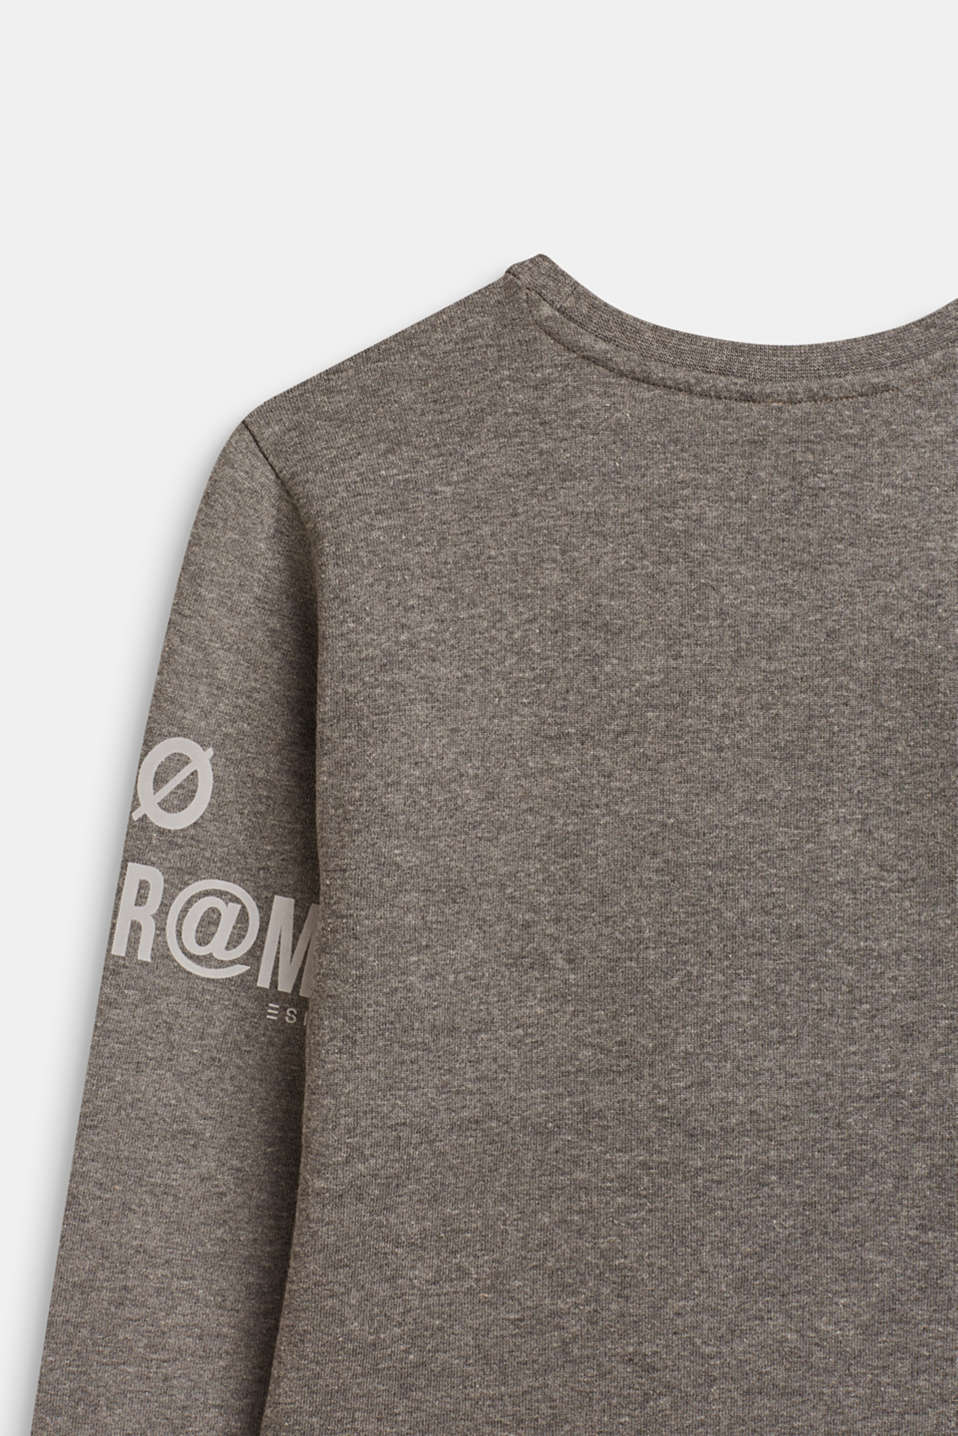 Sweatshirt with print and a zip detail, LCDARK HEATHER G, detail image number 3